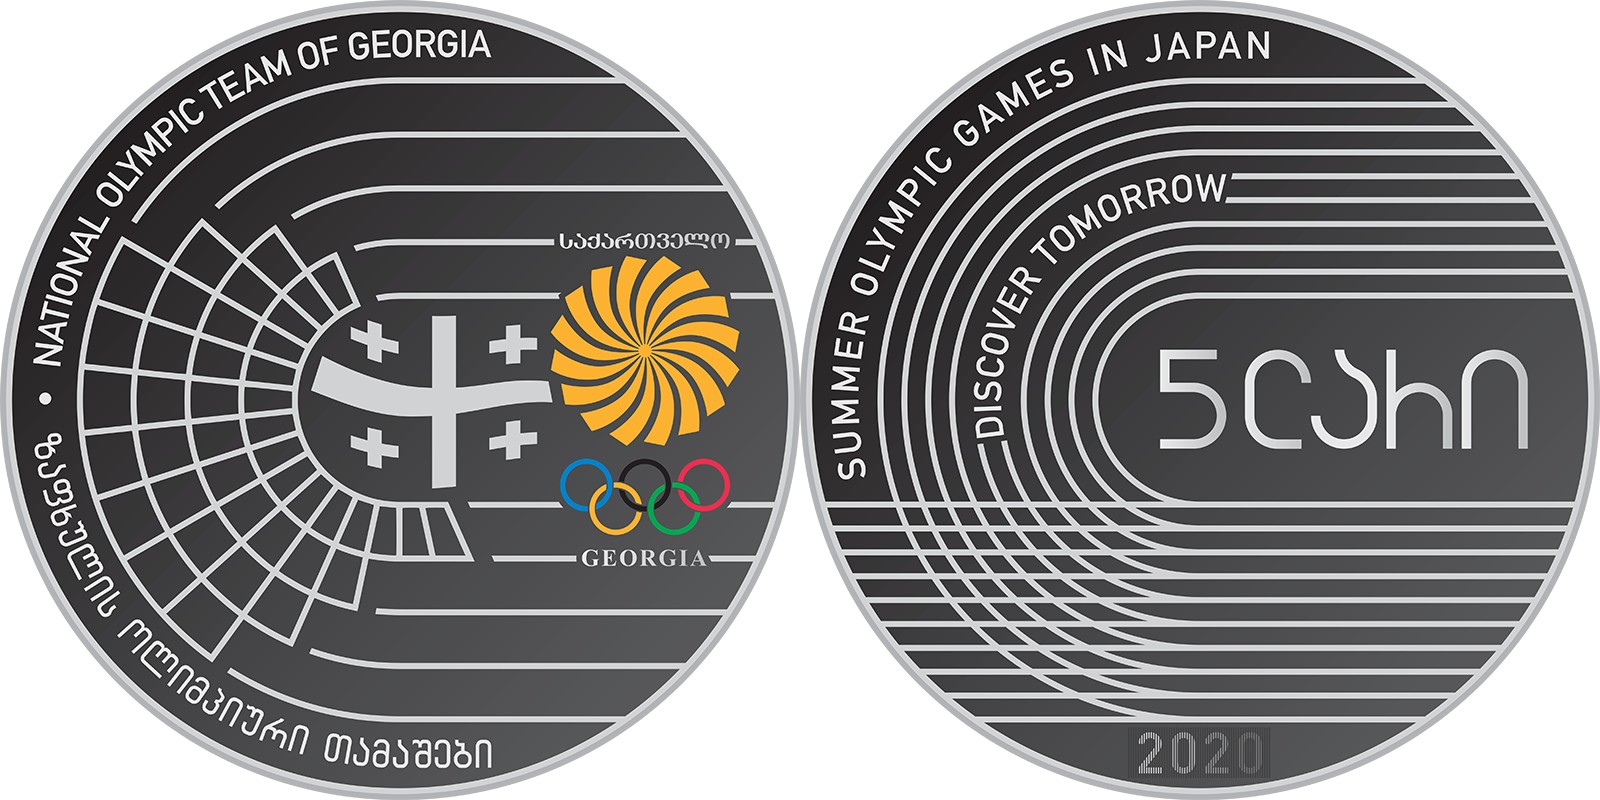 georgie-2020-J